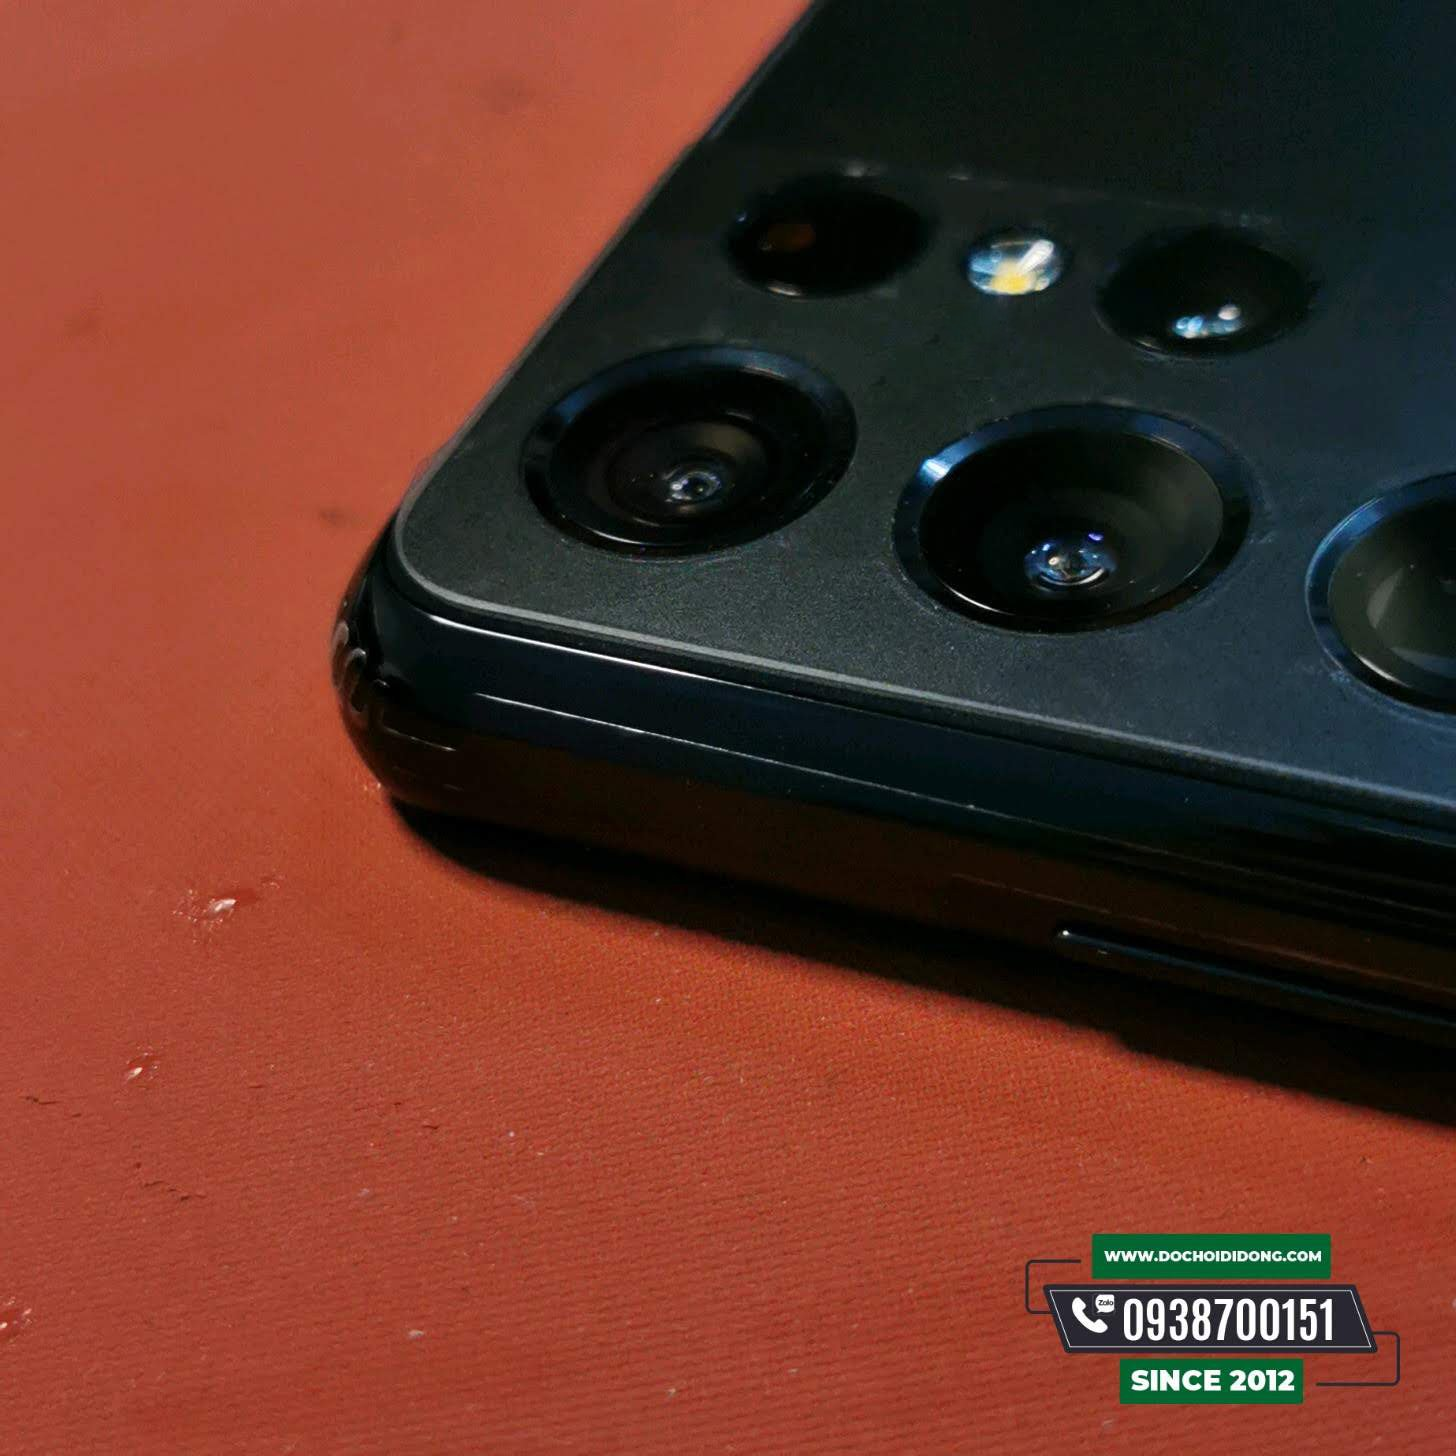 mieng-dan-camera-ppf-samsung-s21-plus-ultra-trong-nham